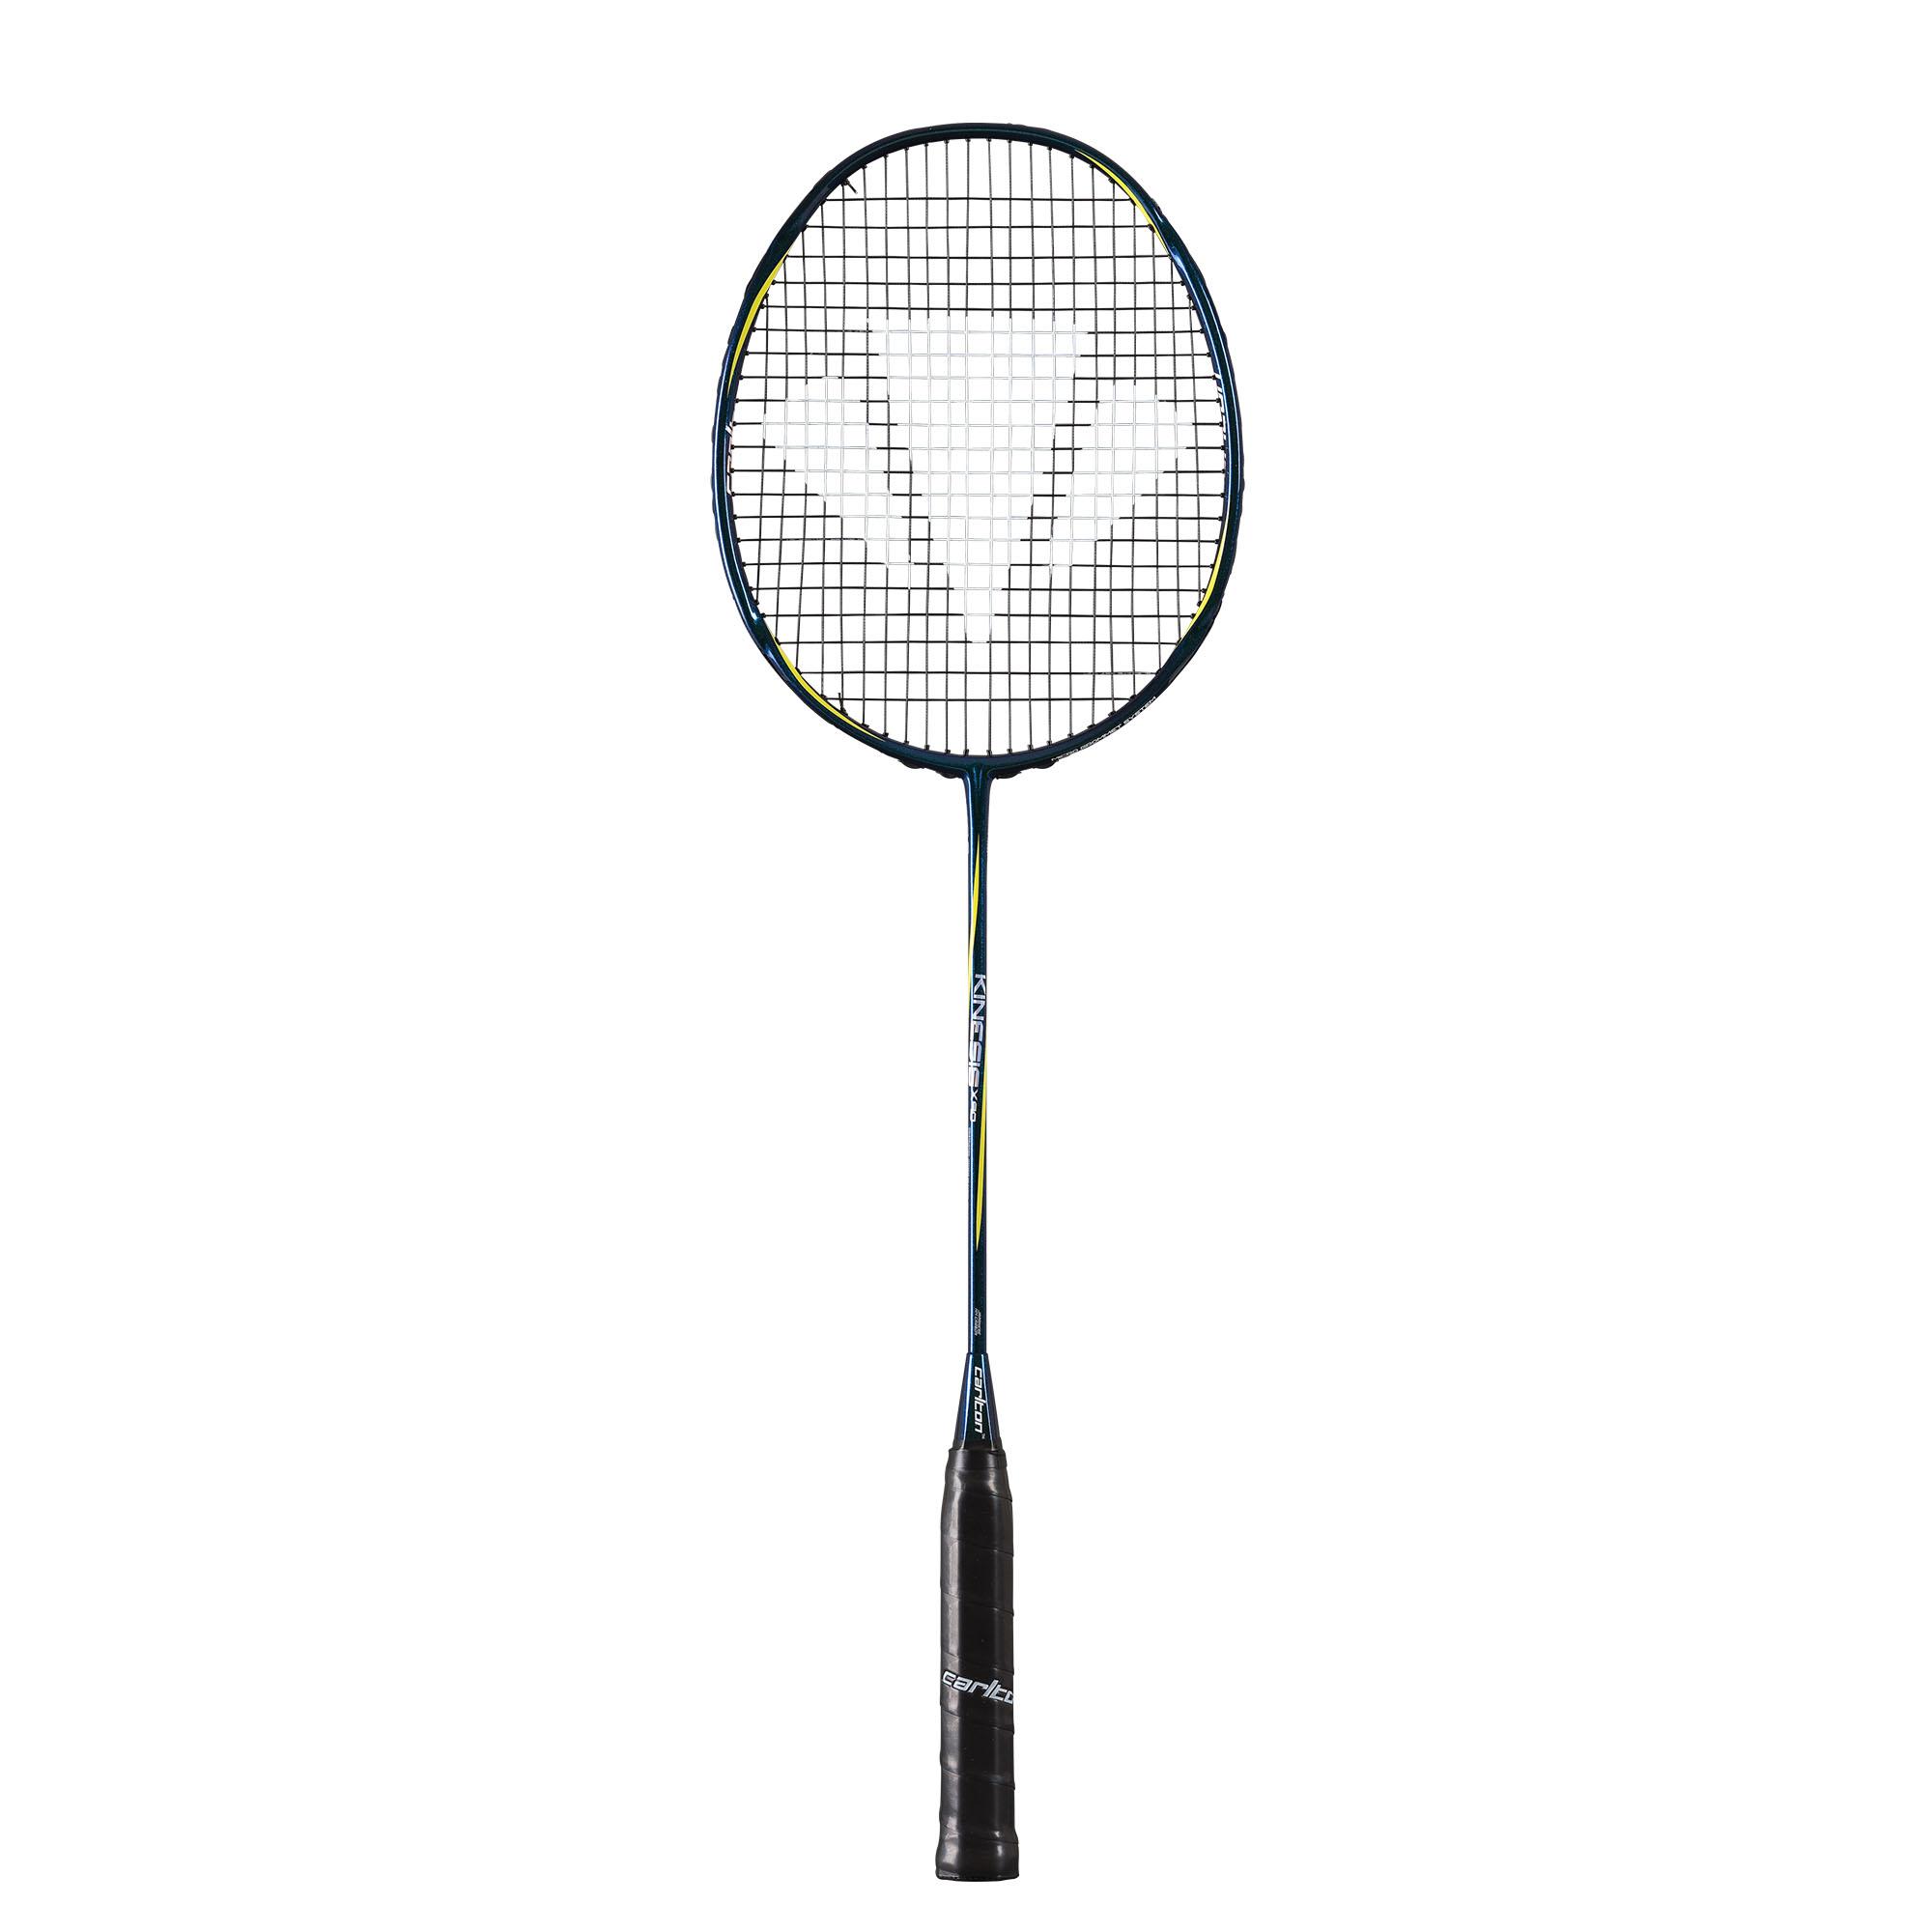 Carlton Badminton Racket Price Comparison Results